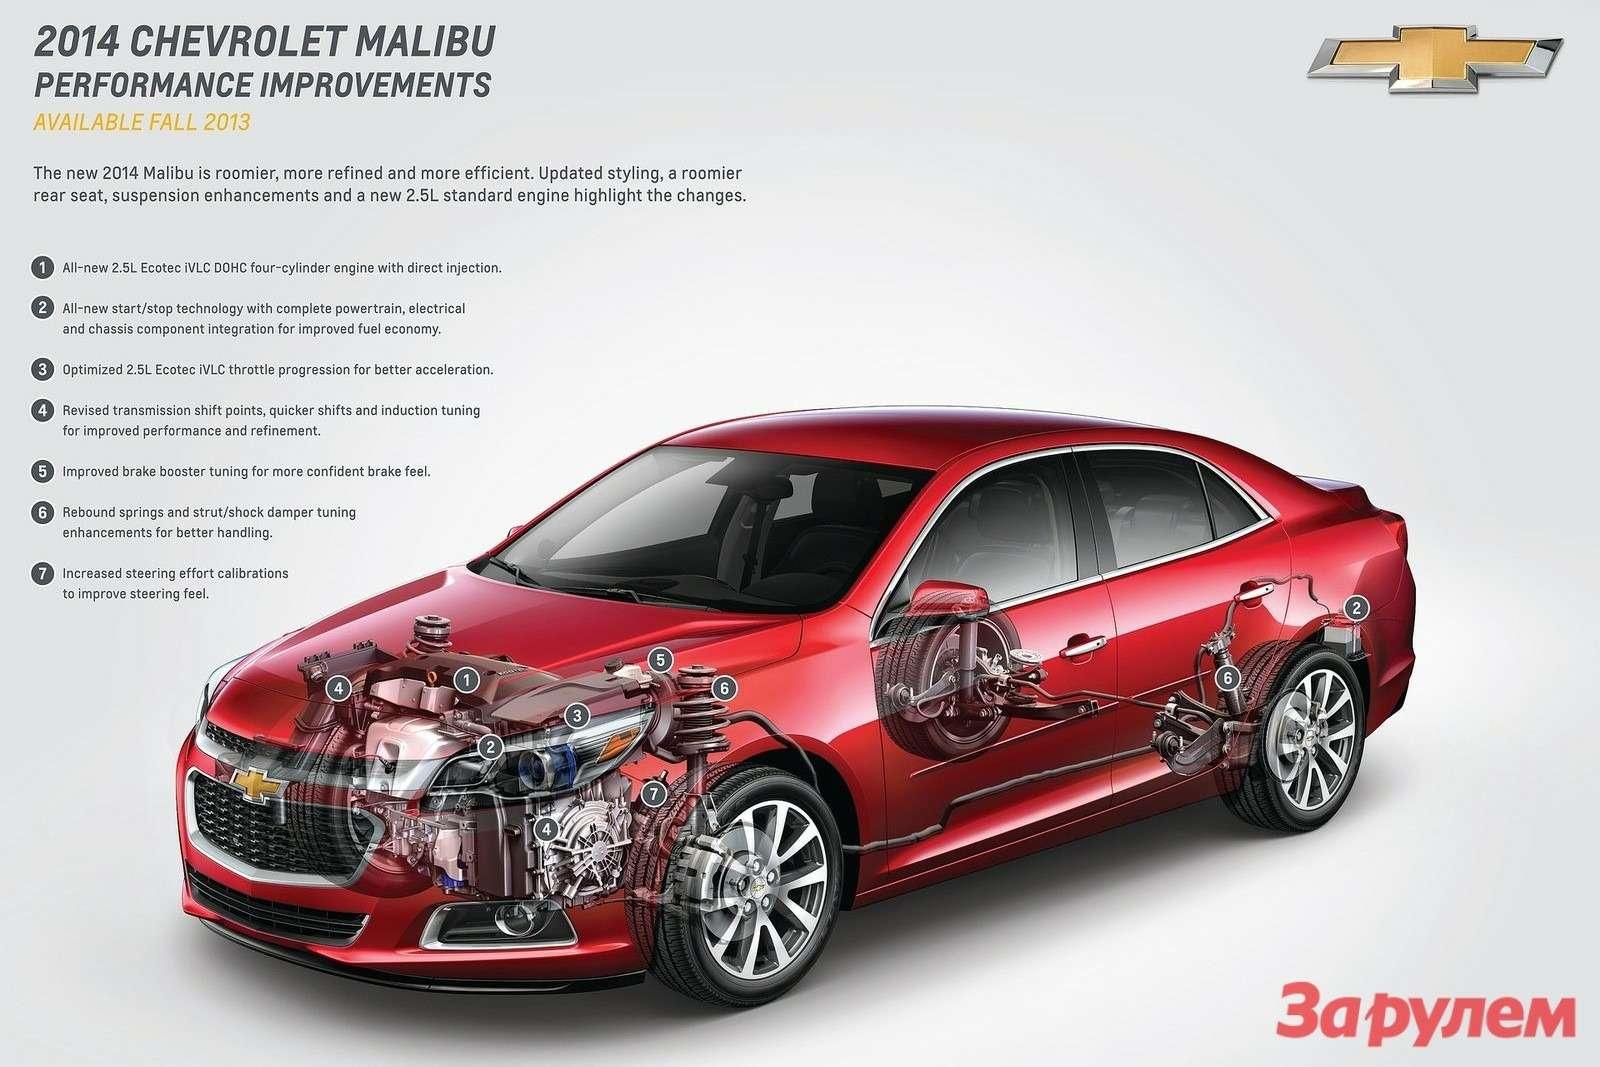 Chevrolet Malibu 2014 1600x1200 wallpaper 08